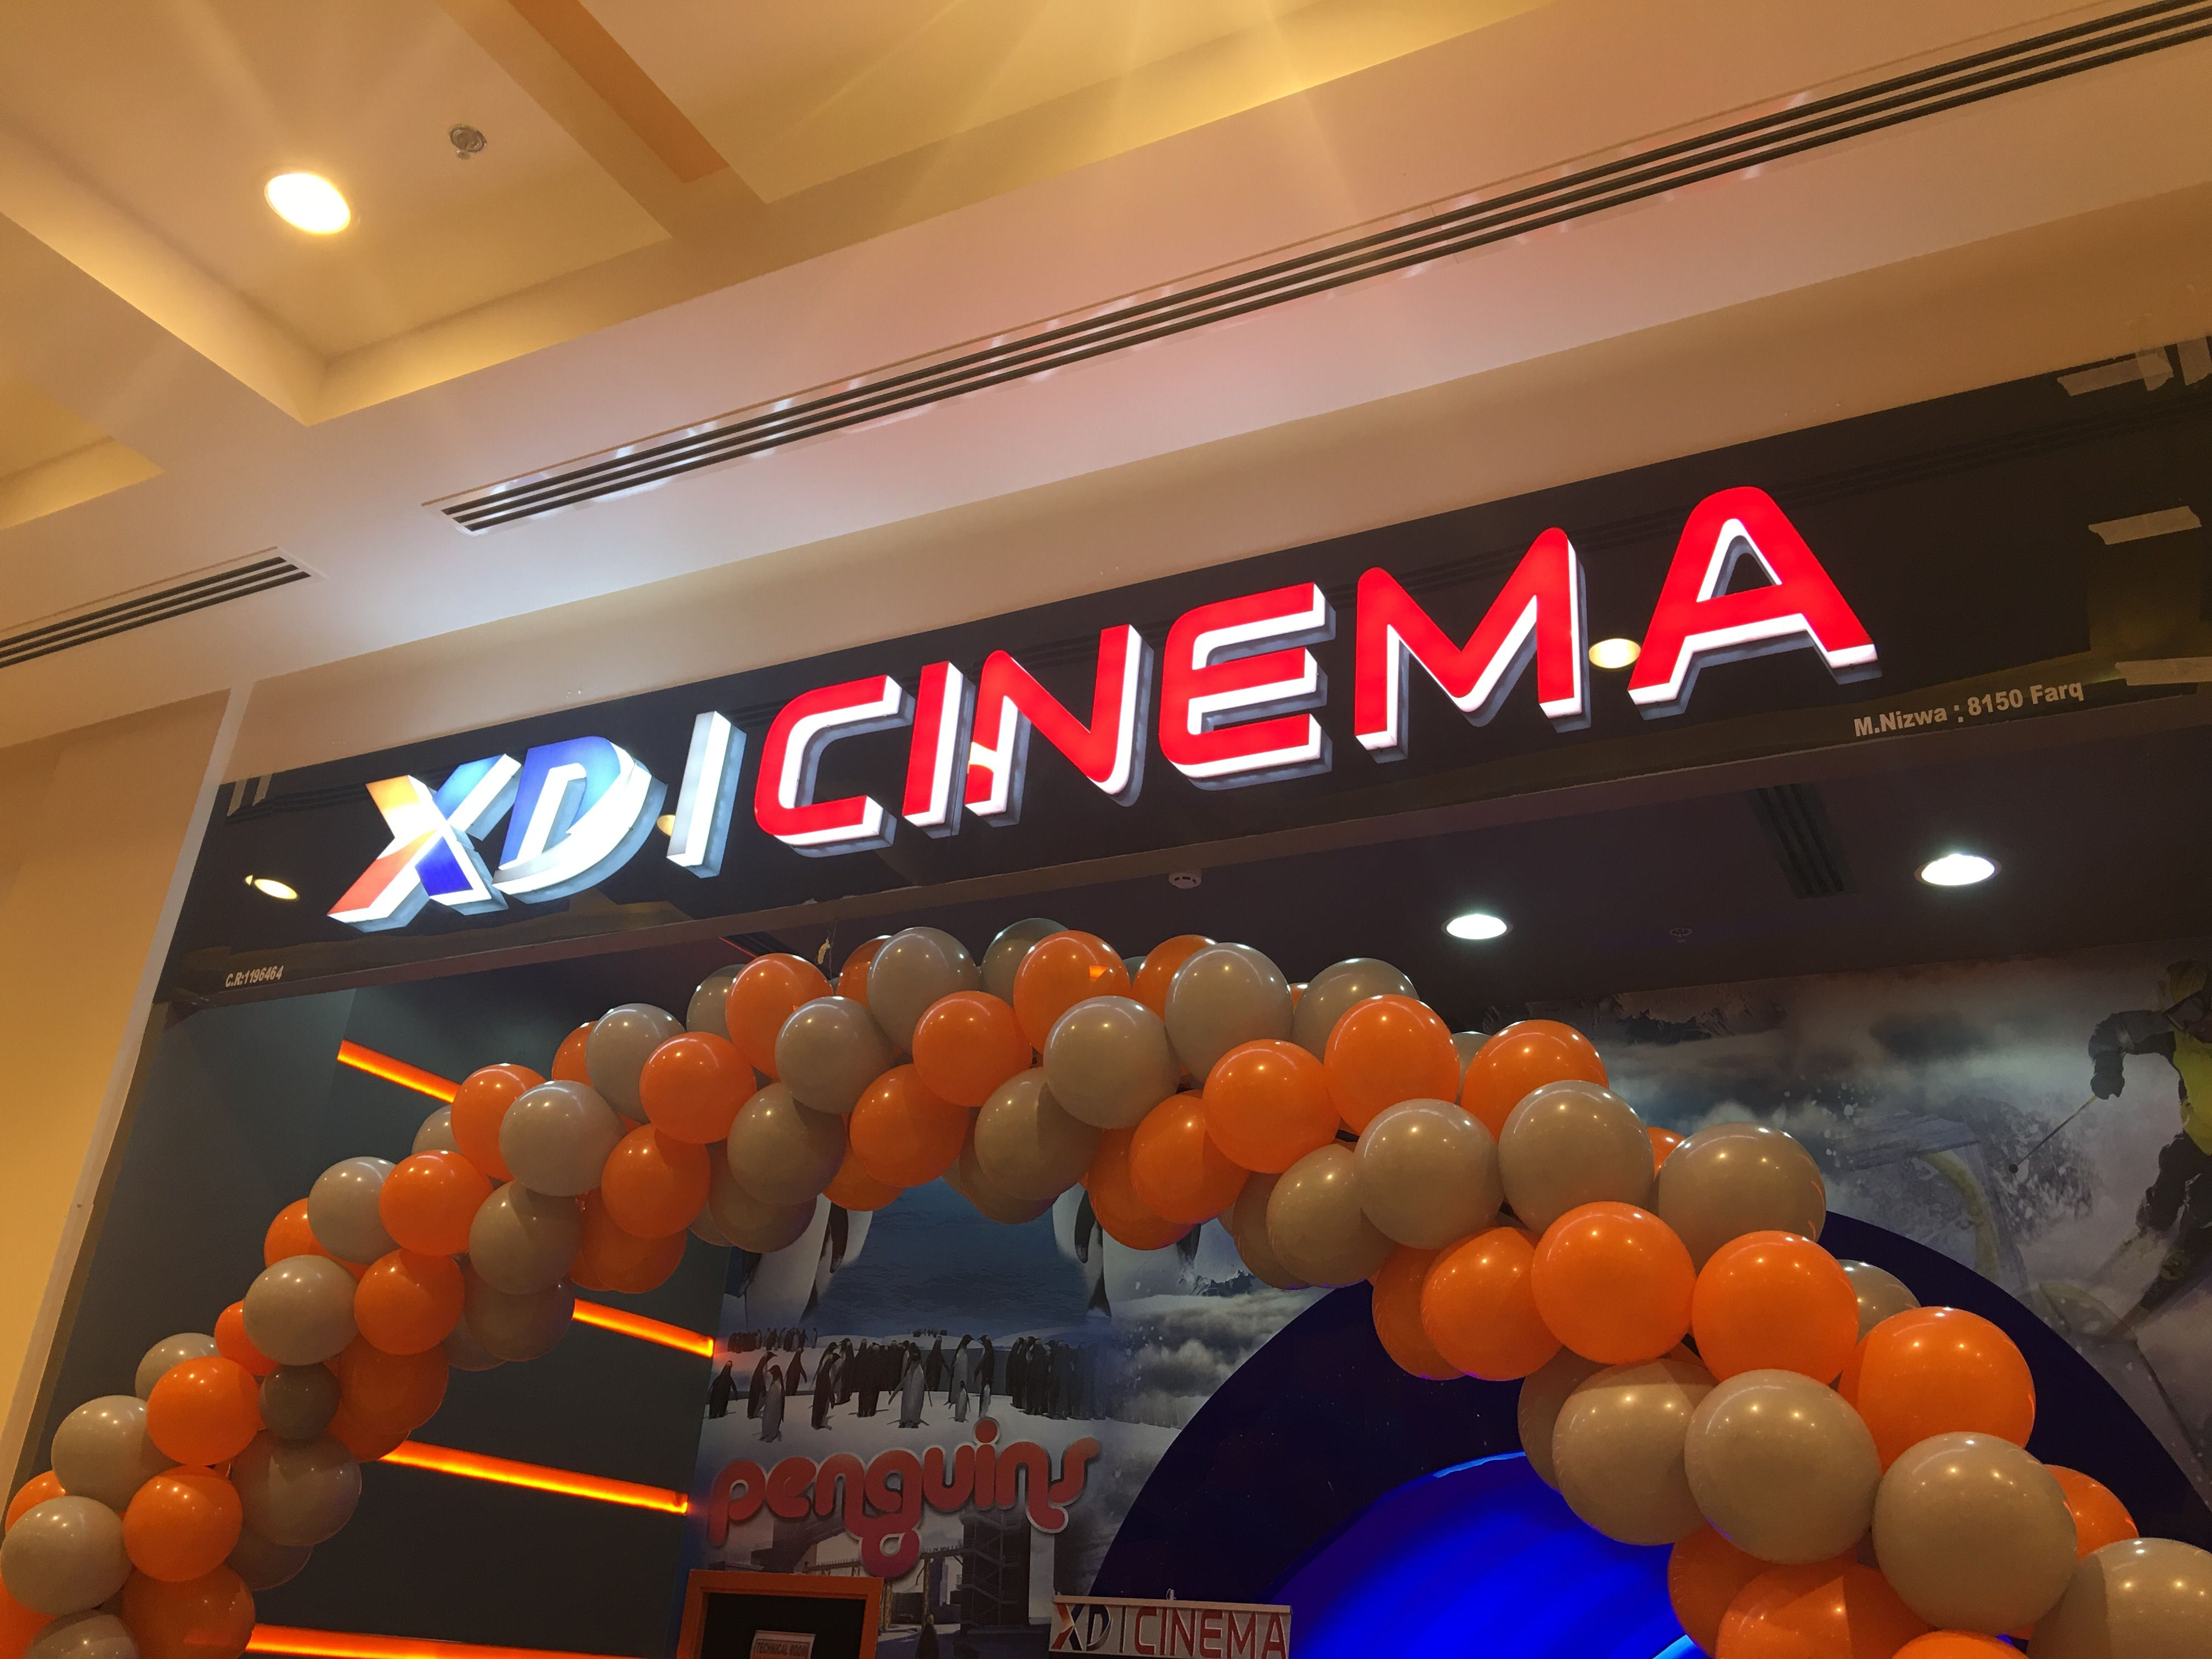 جراند سينما Grand Cinema